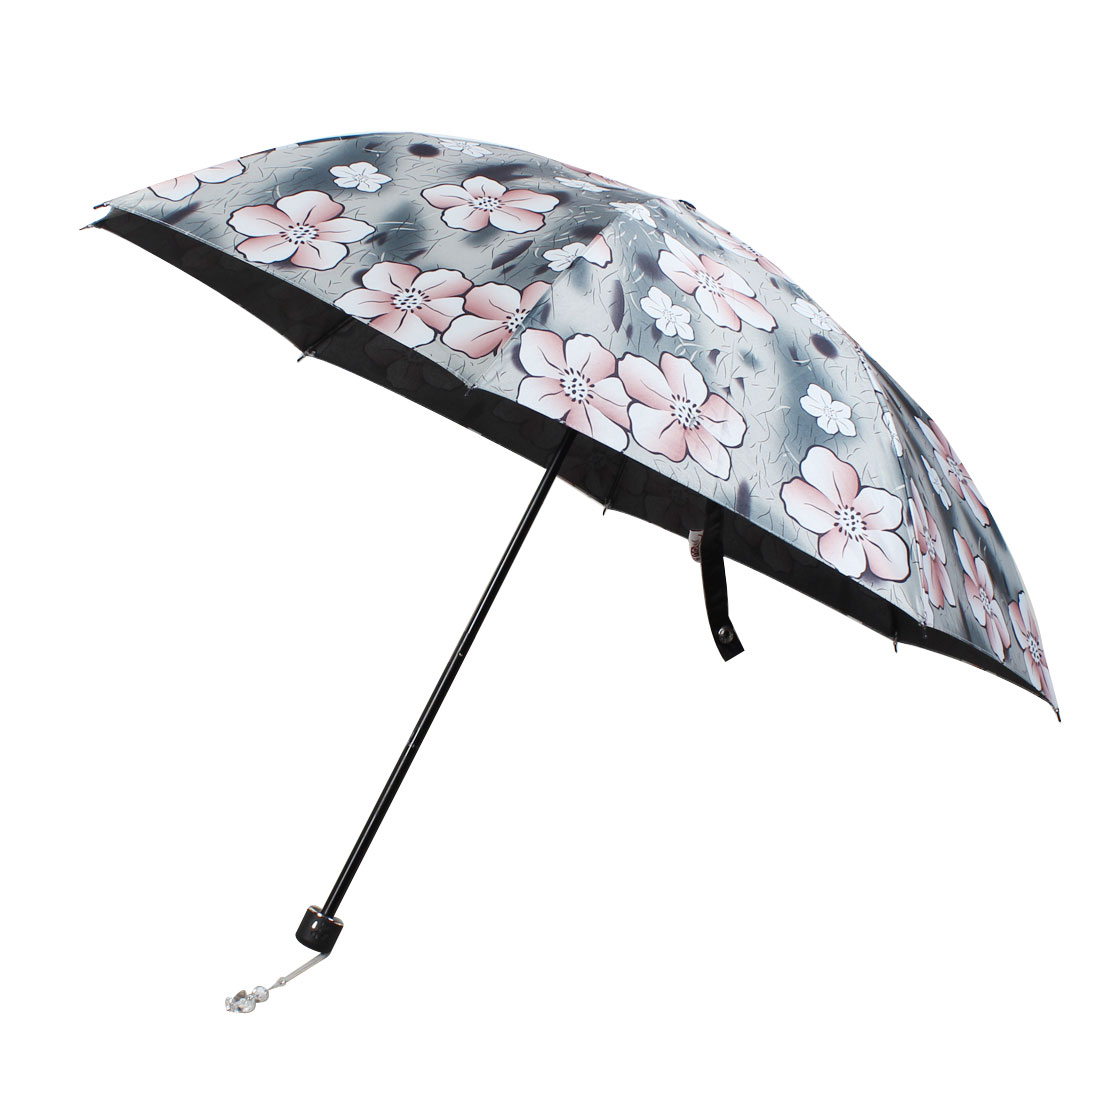 Outdoor Travel Flower Pattern Elastic Foldable Rain Umbrella